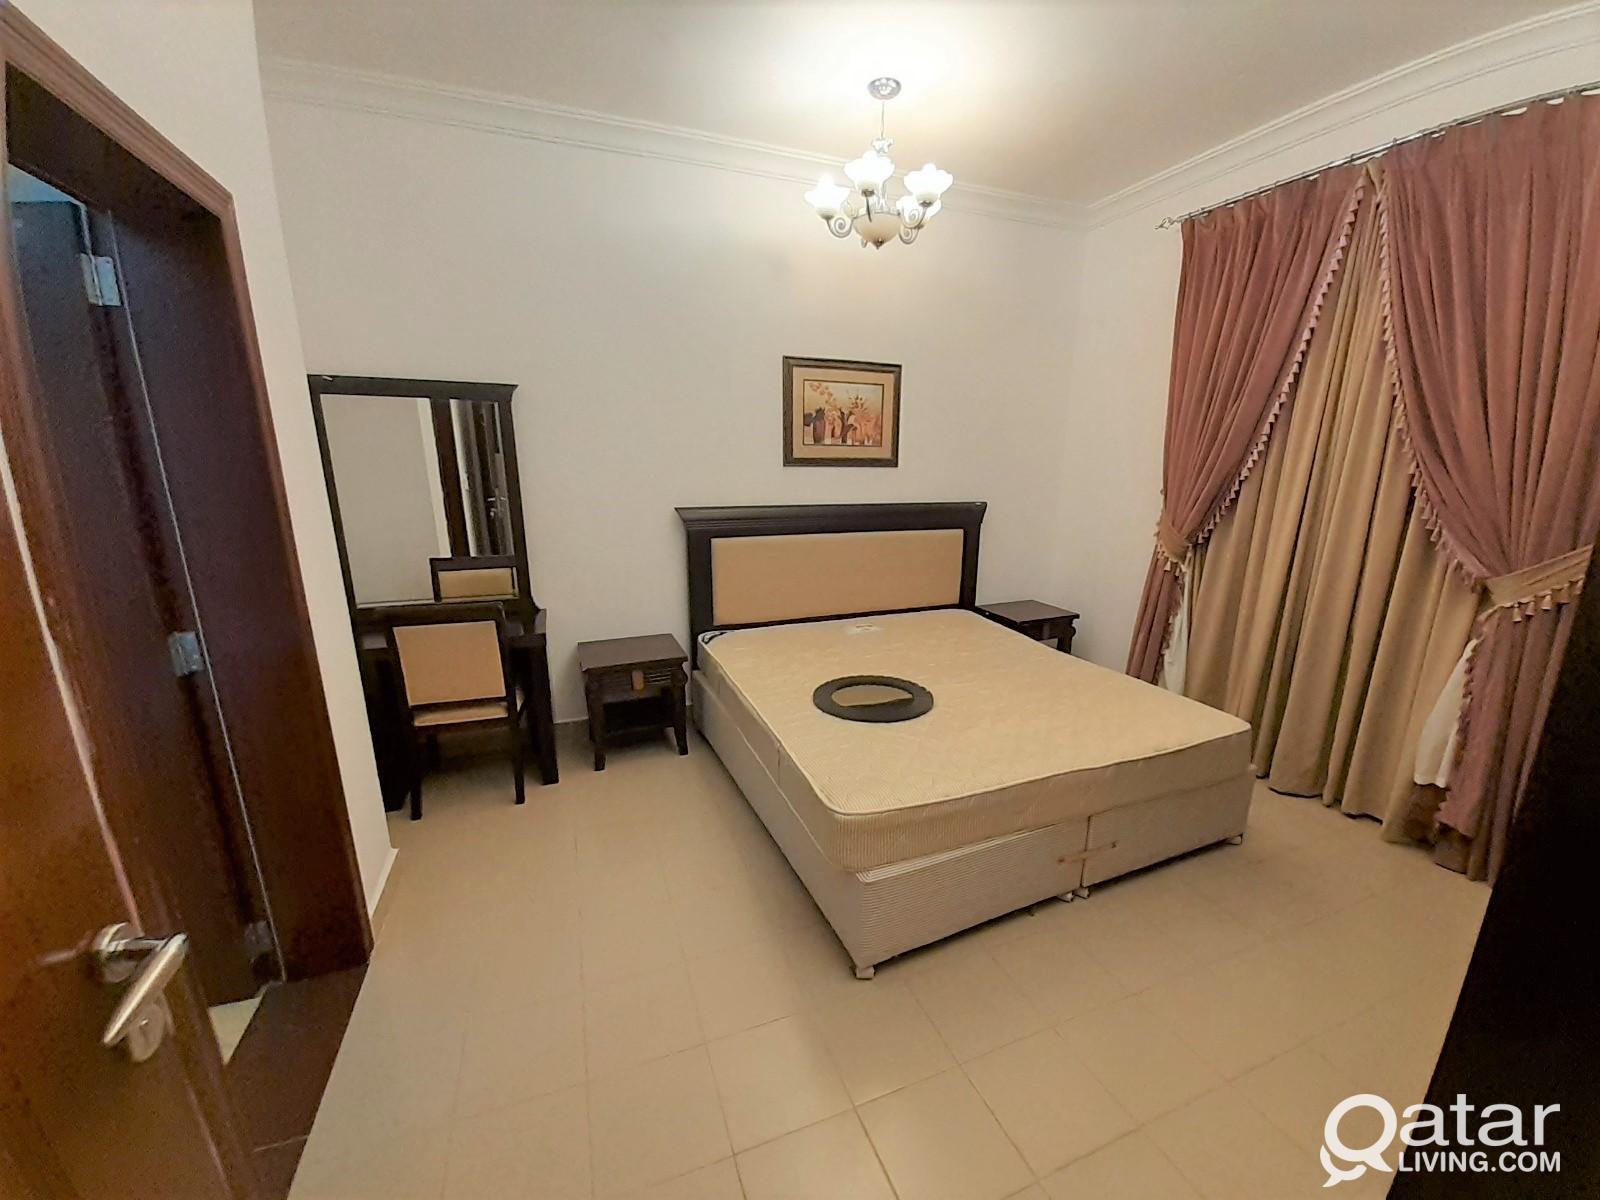 Spacious 3BHK Apt With New Furniture - Mushreib